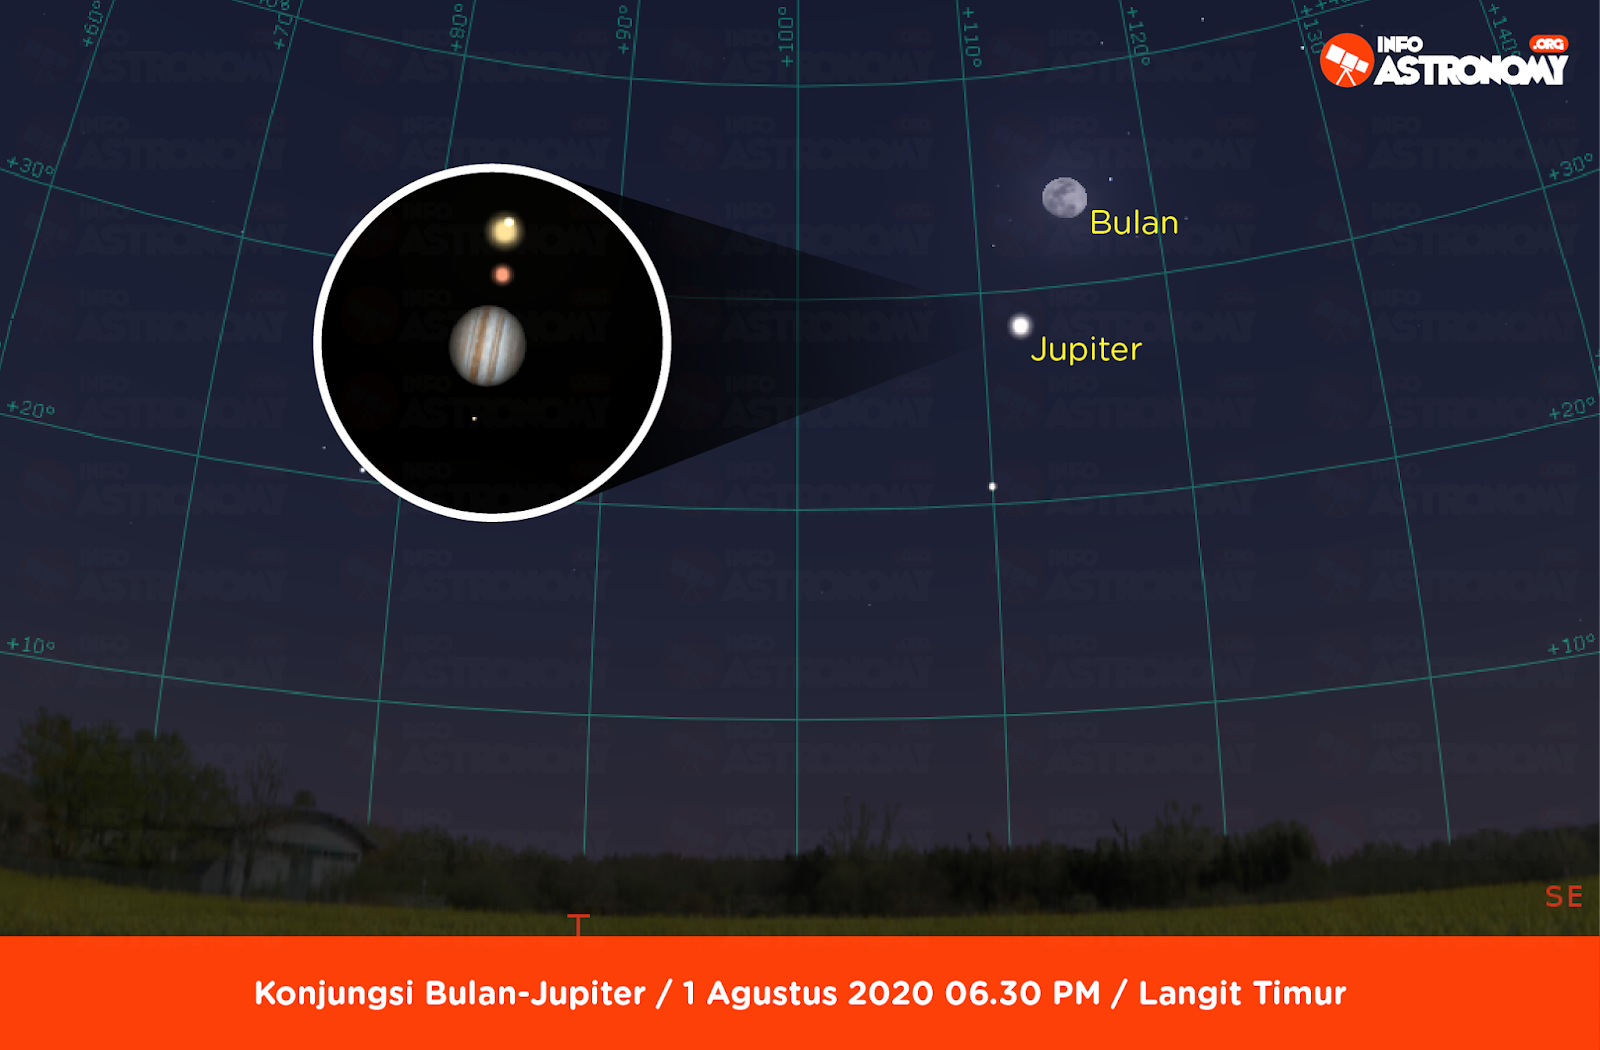 Jadwal Peristiwa Langit Agustus 2020 - Info Astronomy